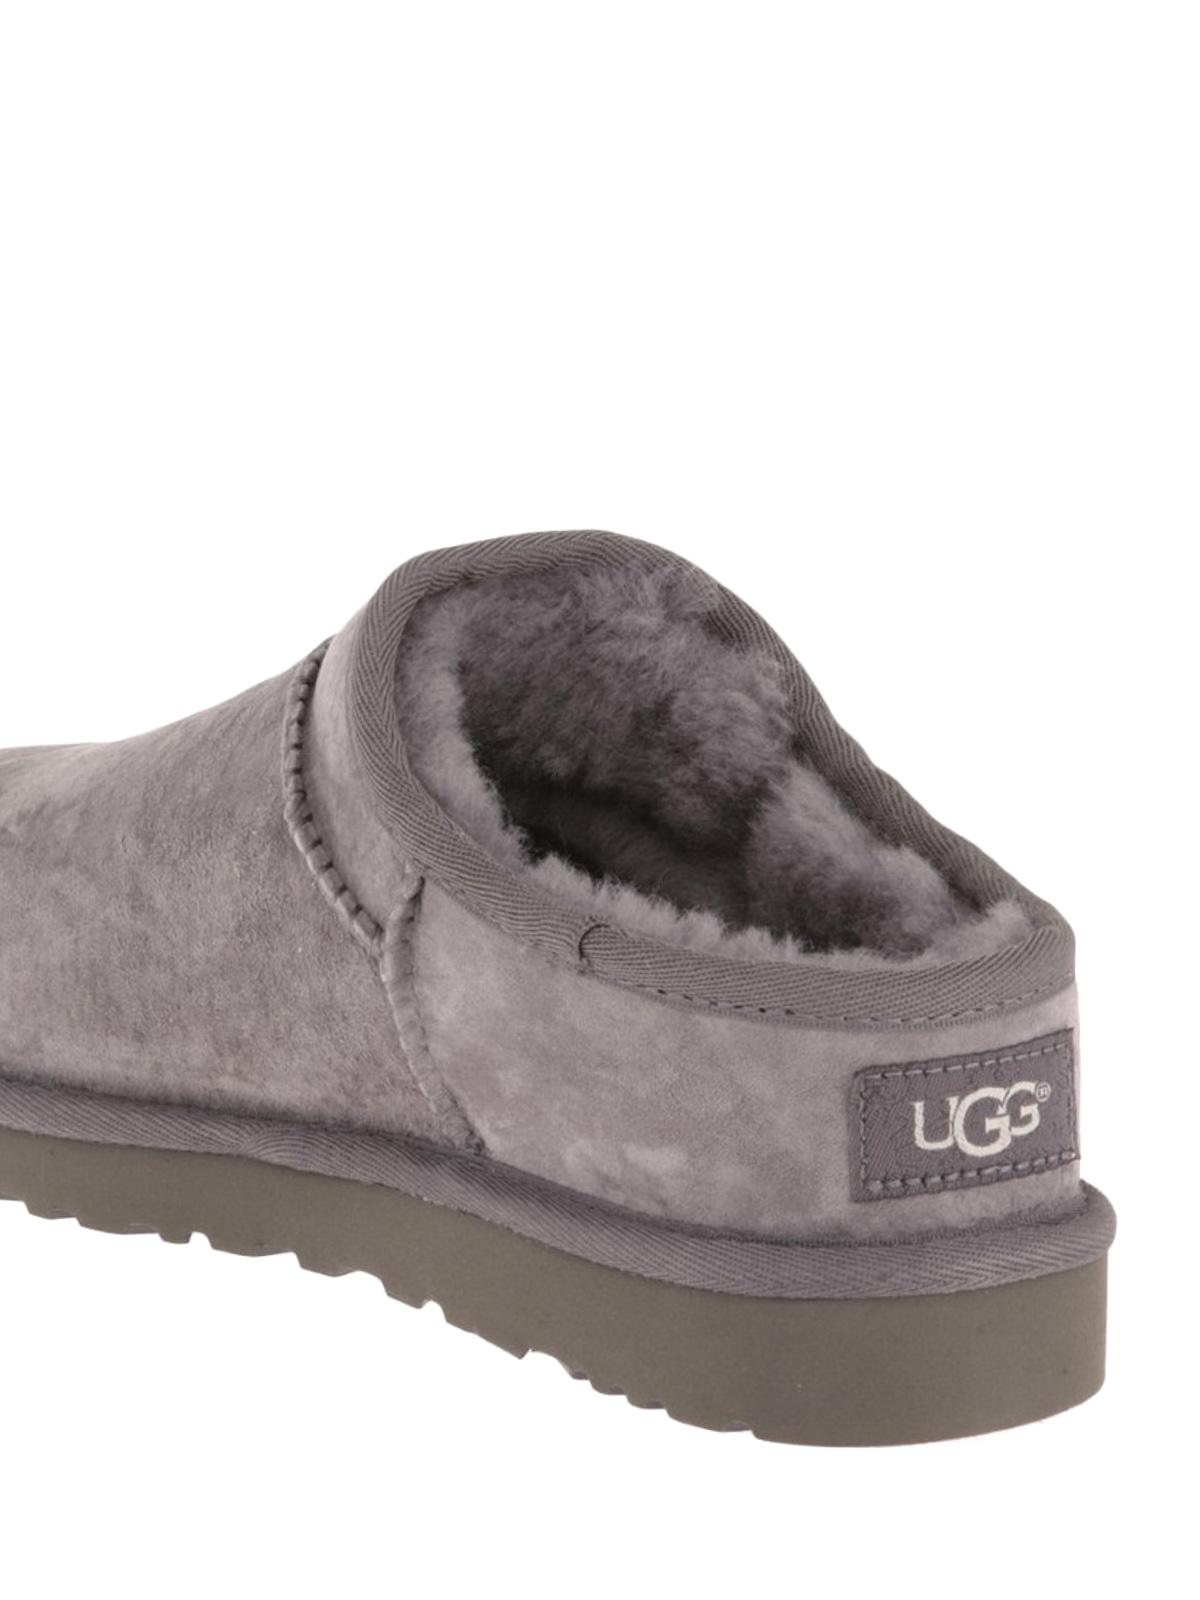 565ec9d9f64 Ugg - Classic Slipper - Loafers   Slippers - 1009249 GREY